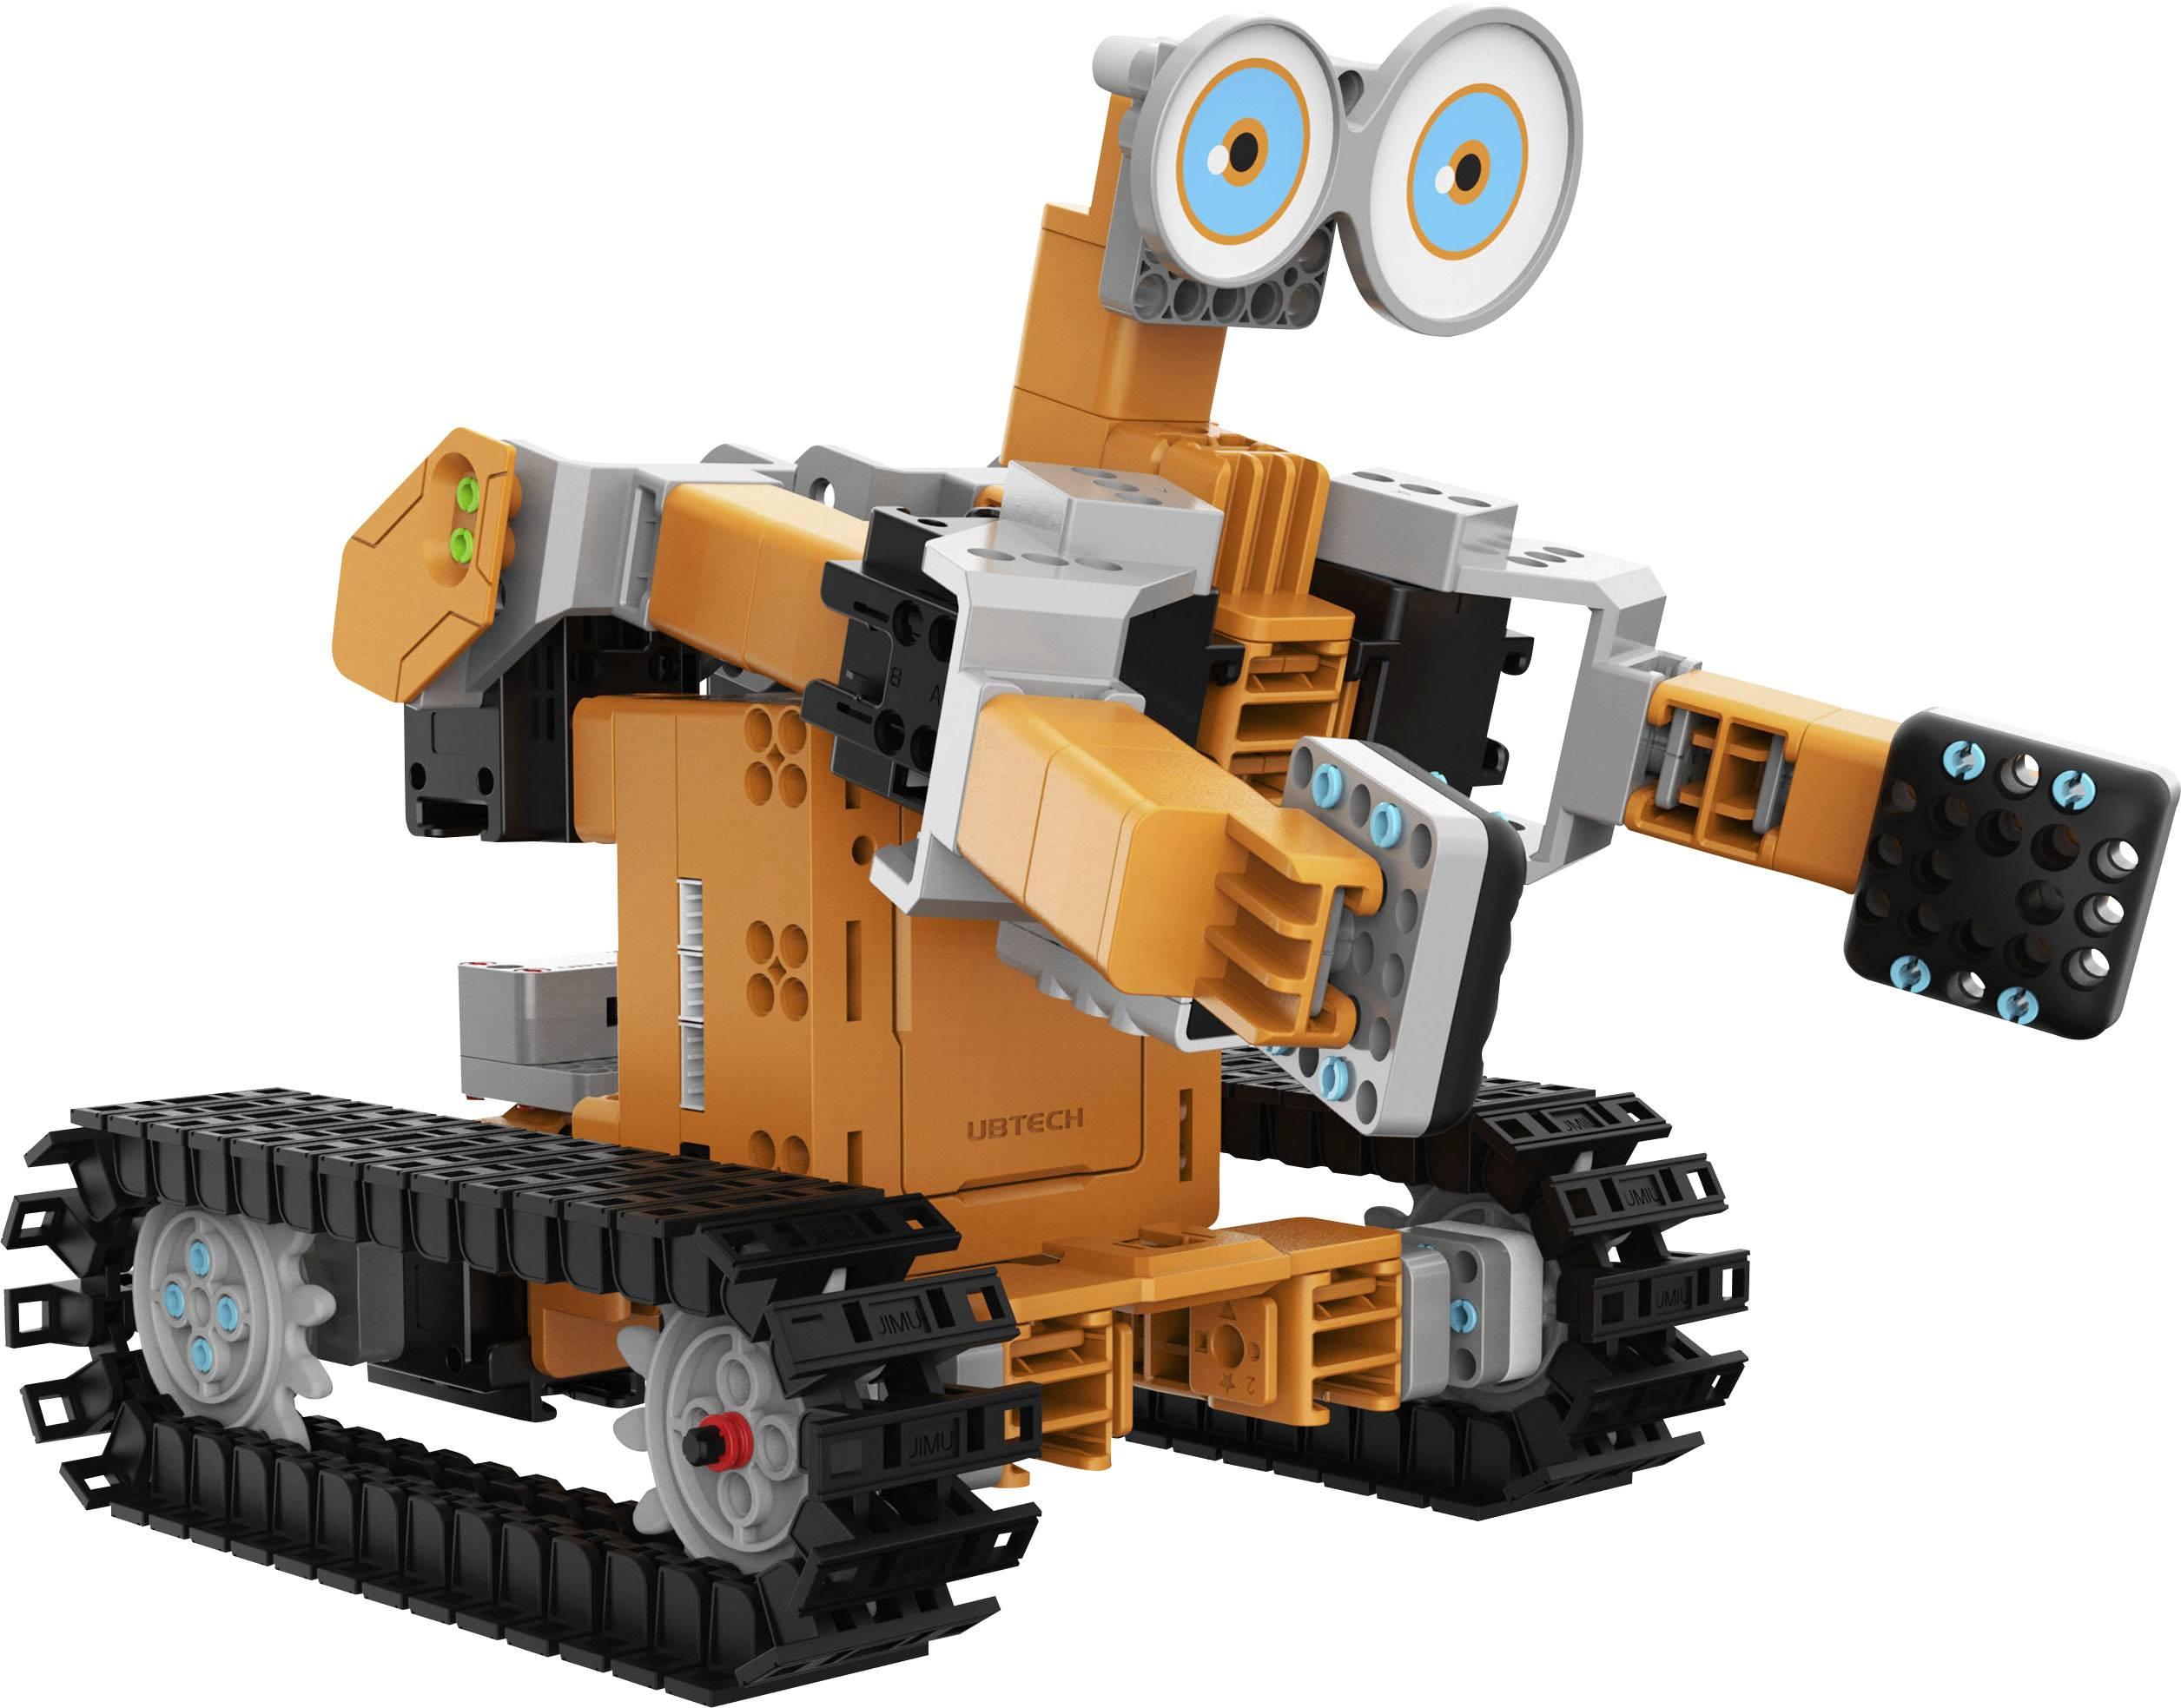 Stavebnica robota Ubtech Jimu Robot TankBot Kit